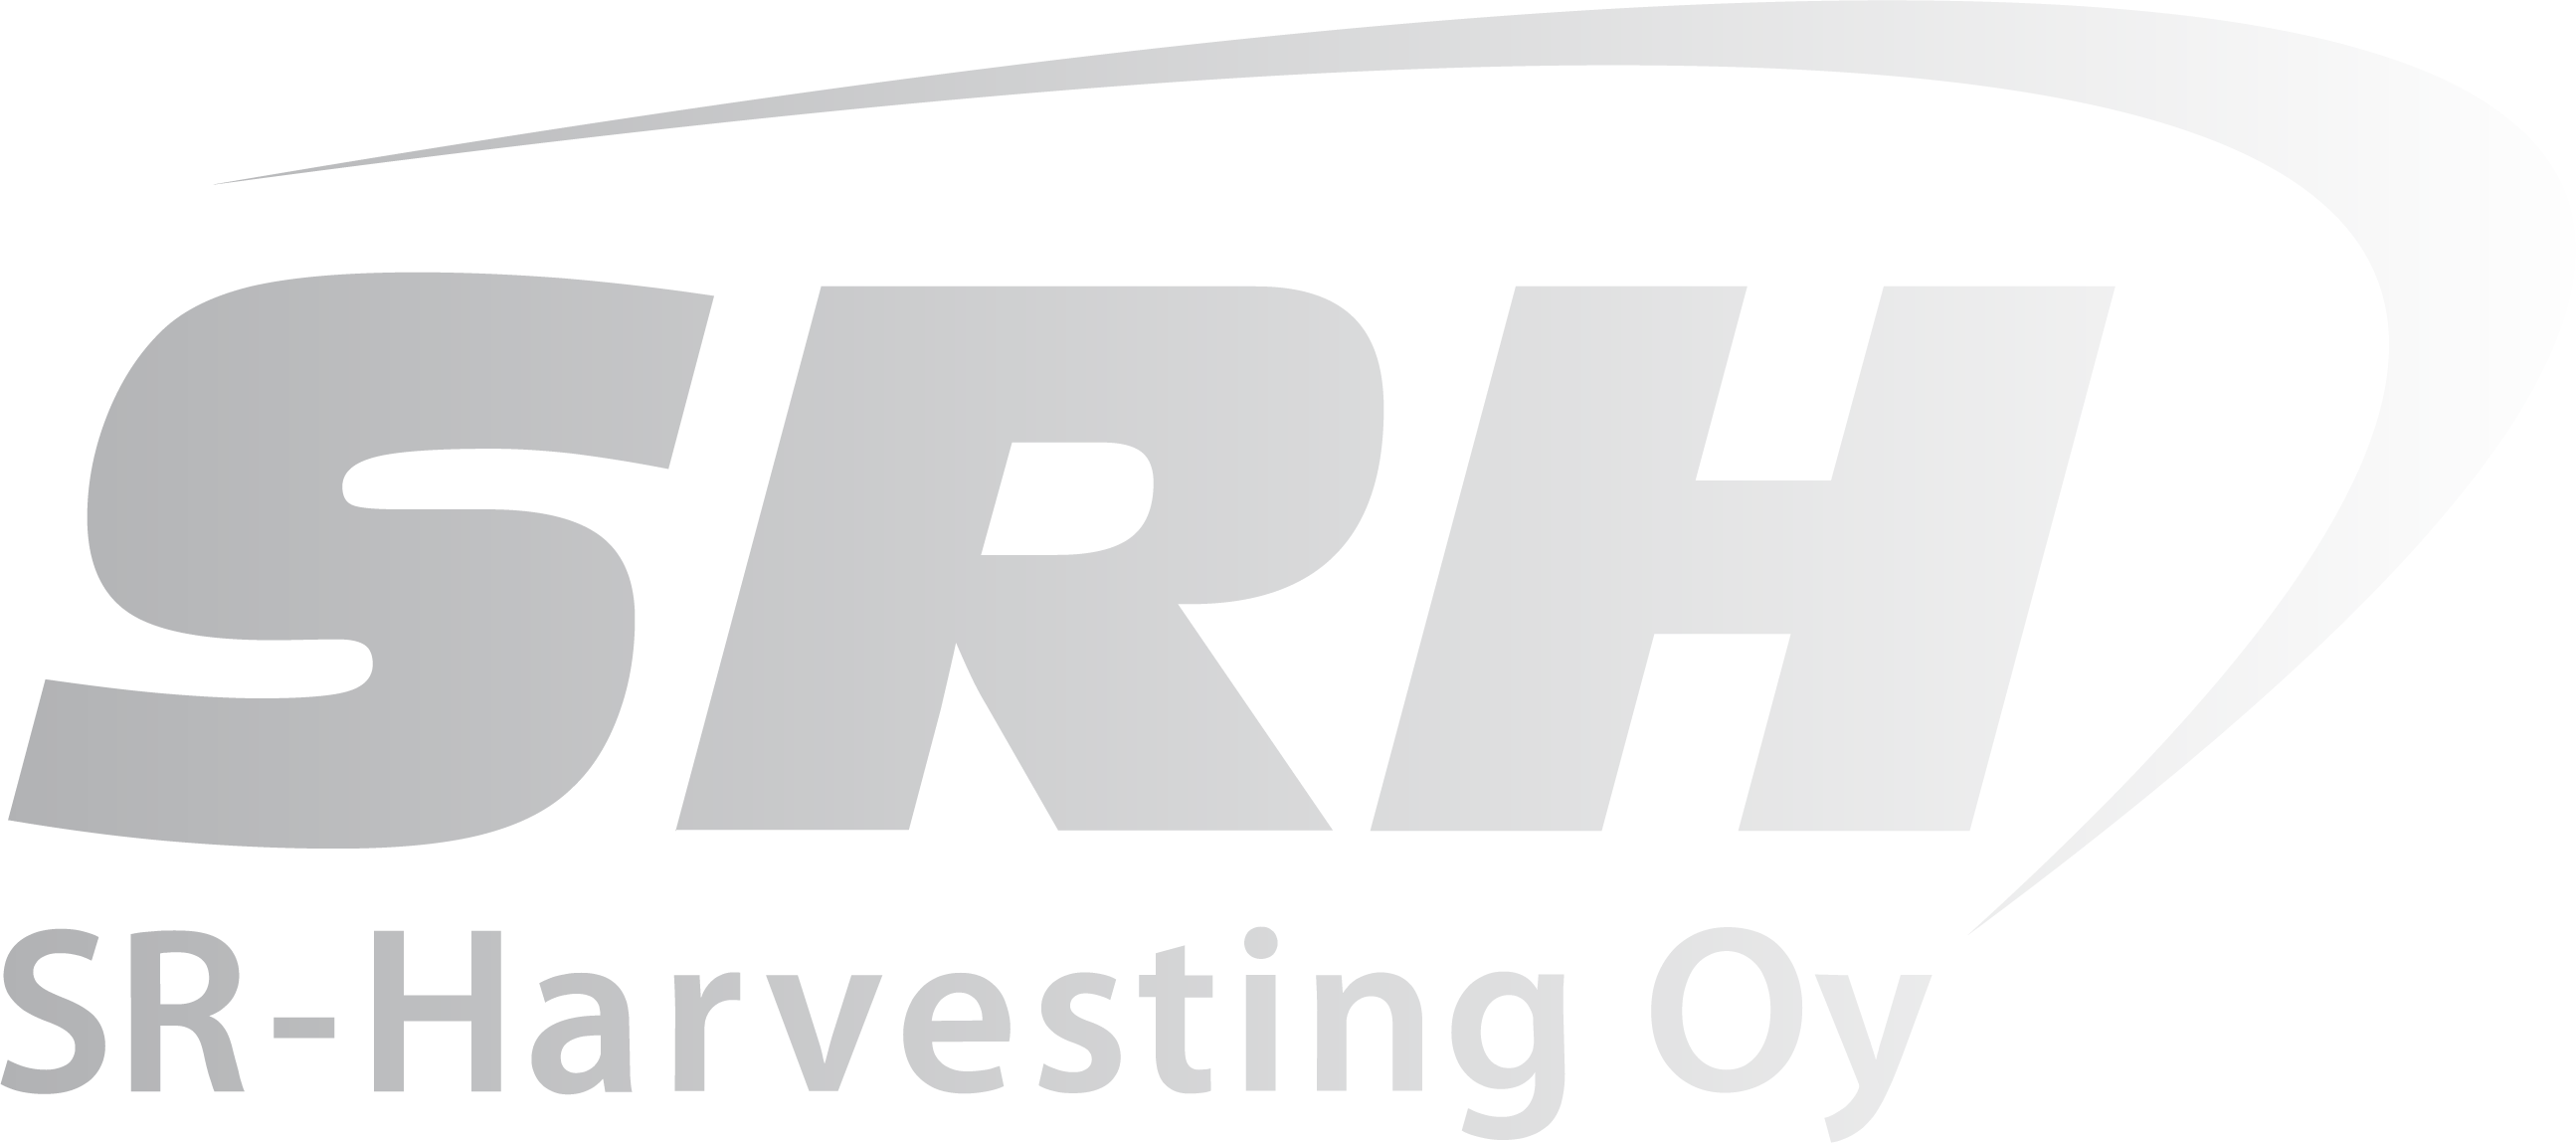 SR-Harvesting